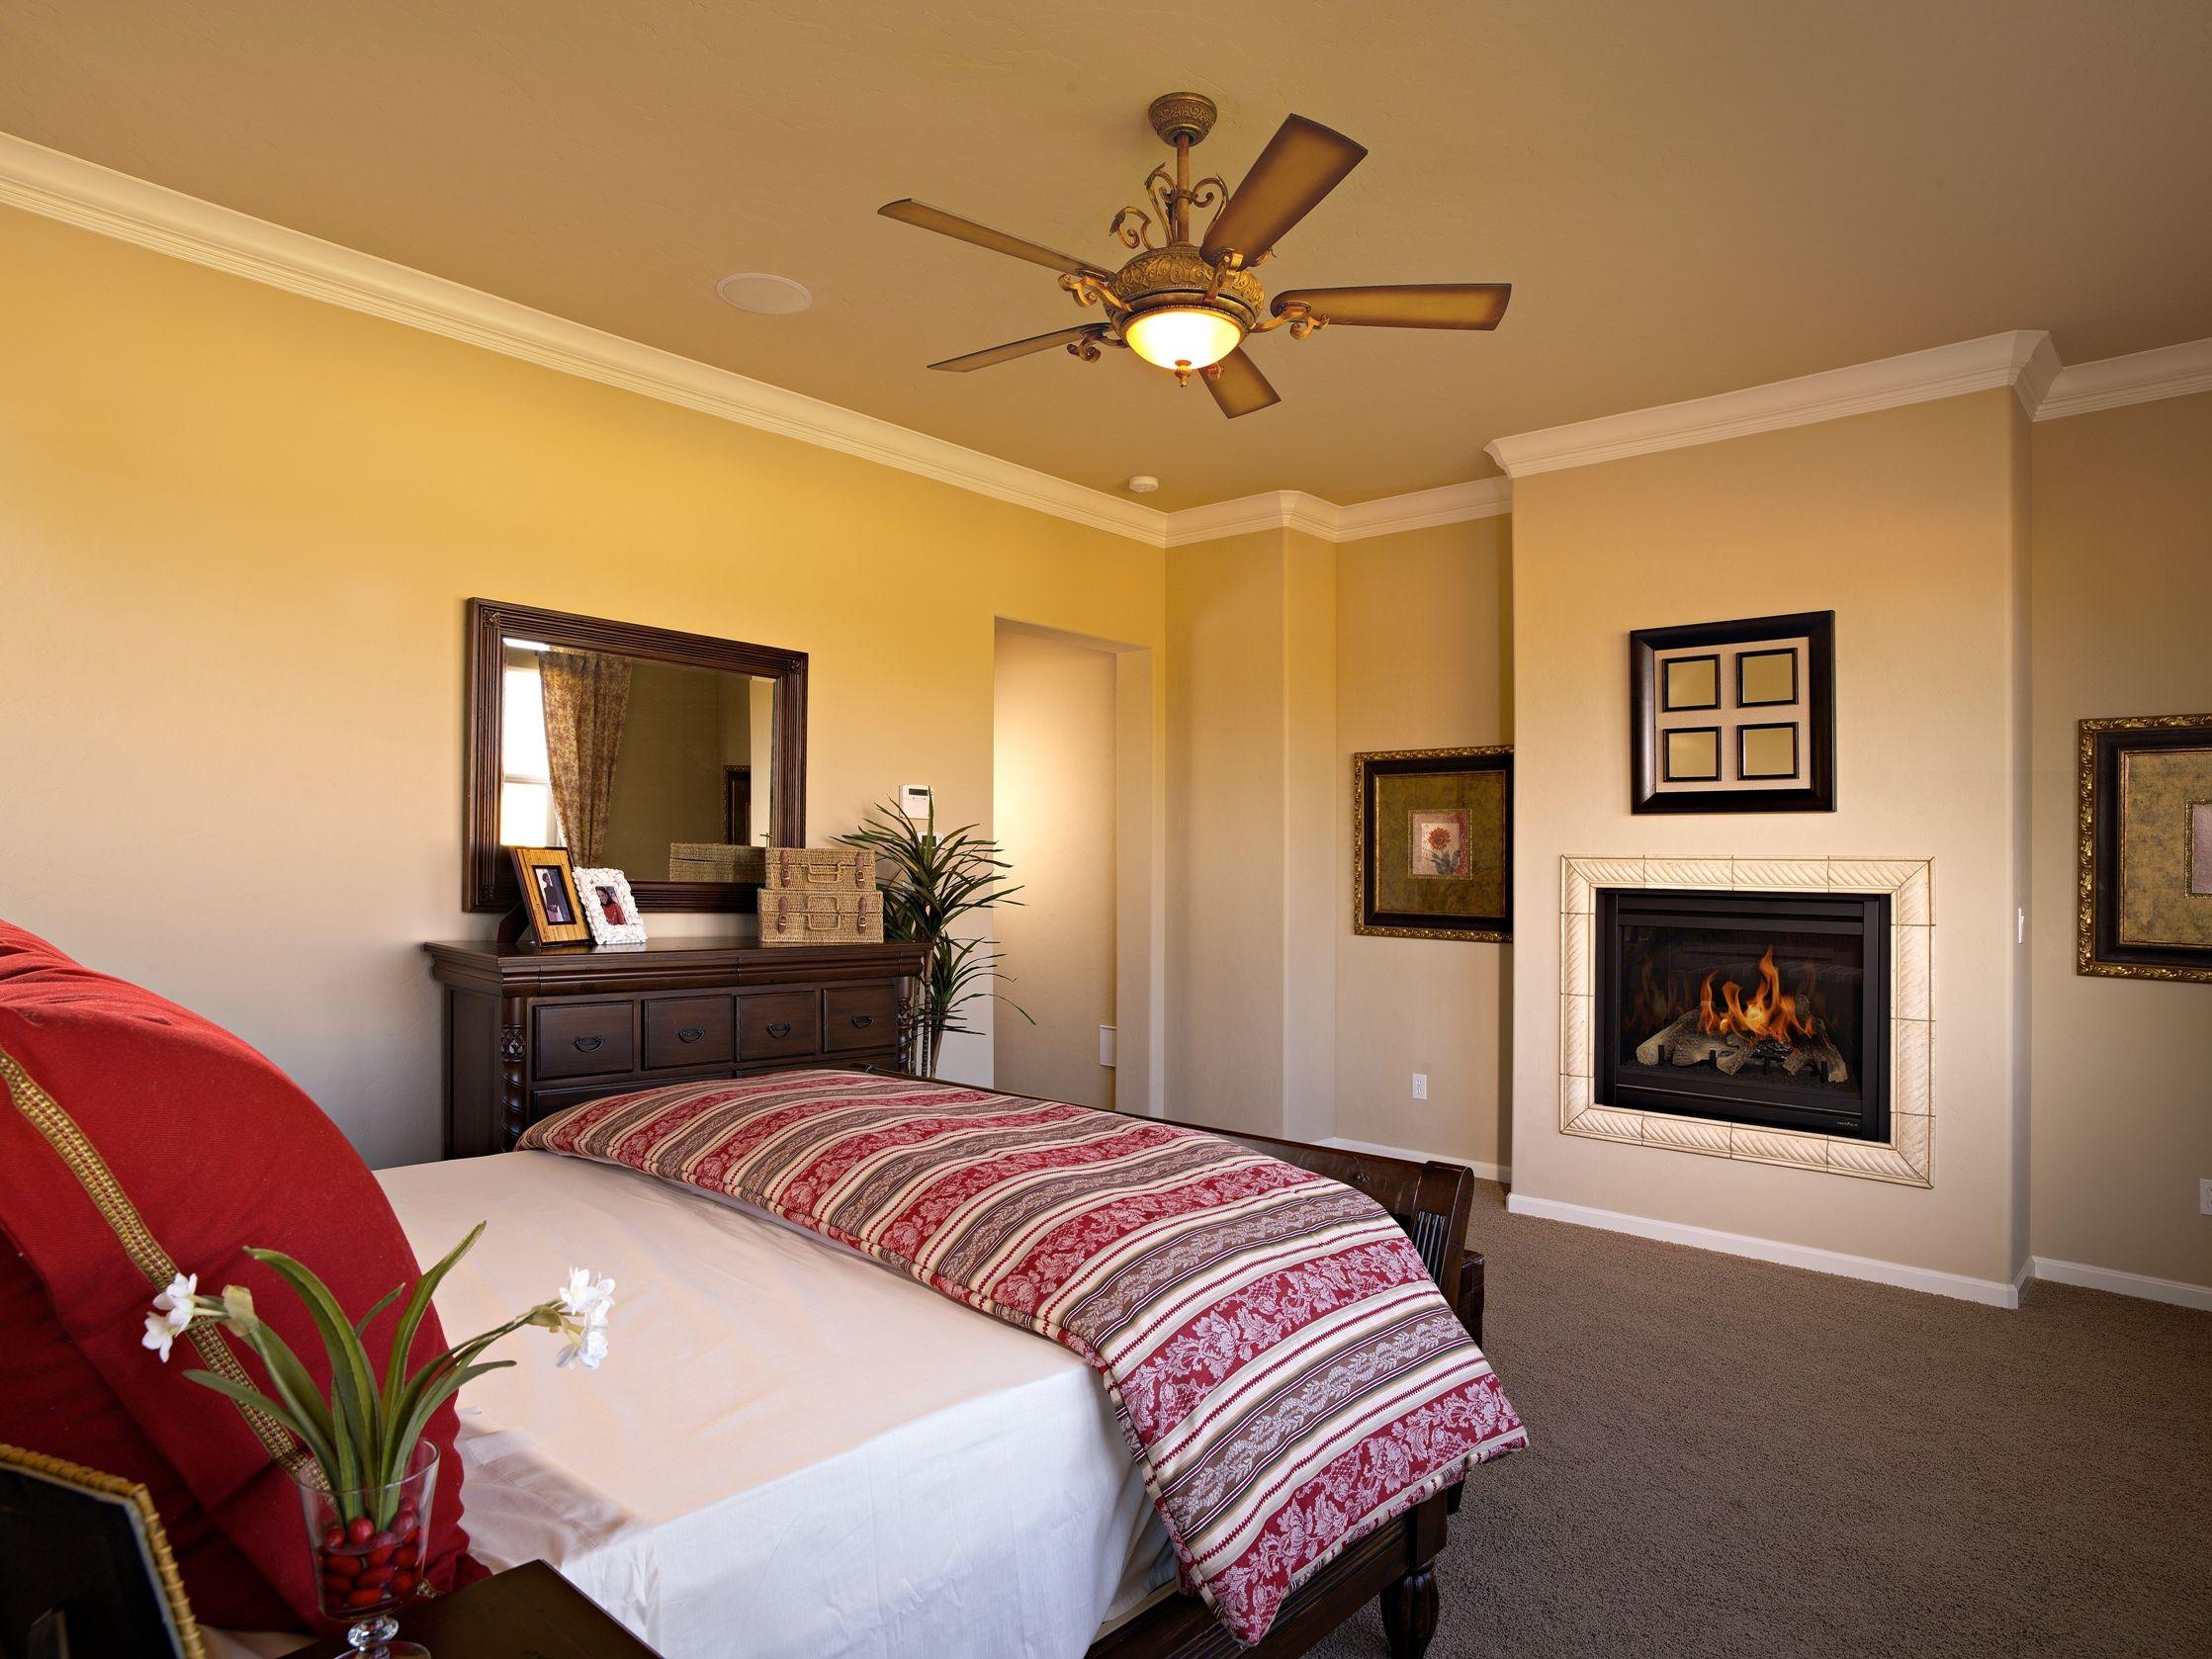 The Residence 240 Master Bedroom   Model homes, Residences ... on Model Bedroom Design  id=14384